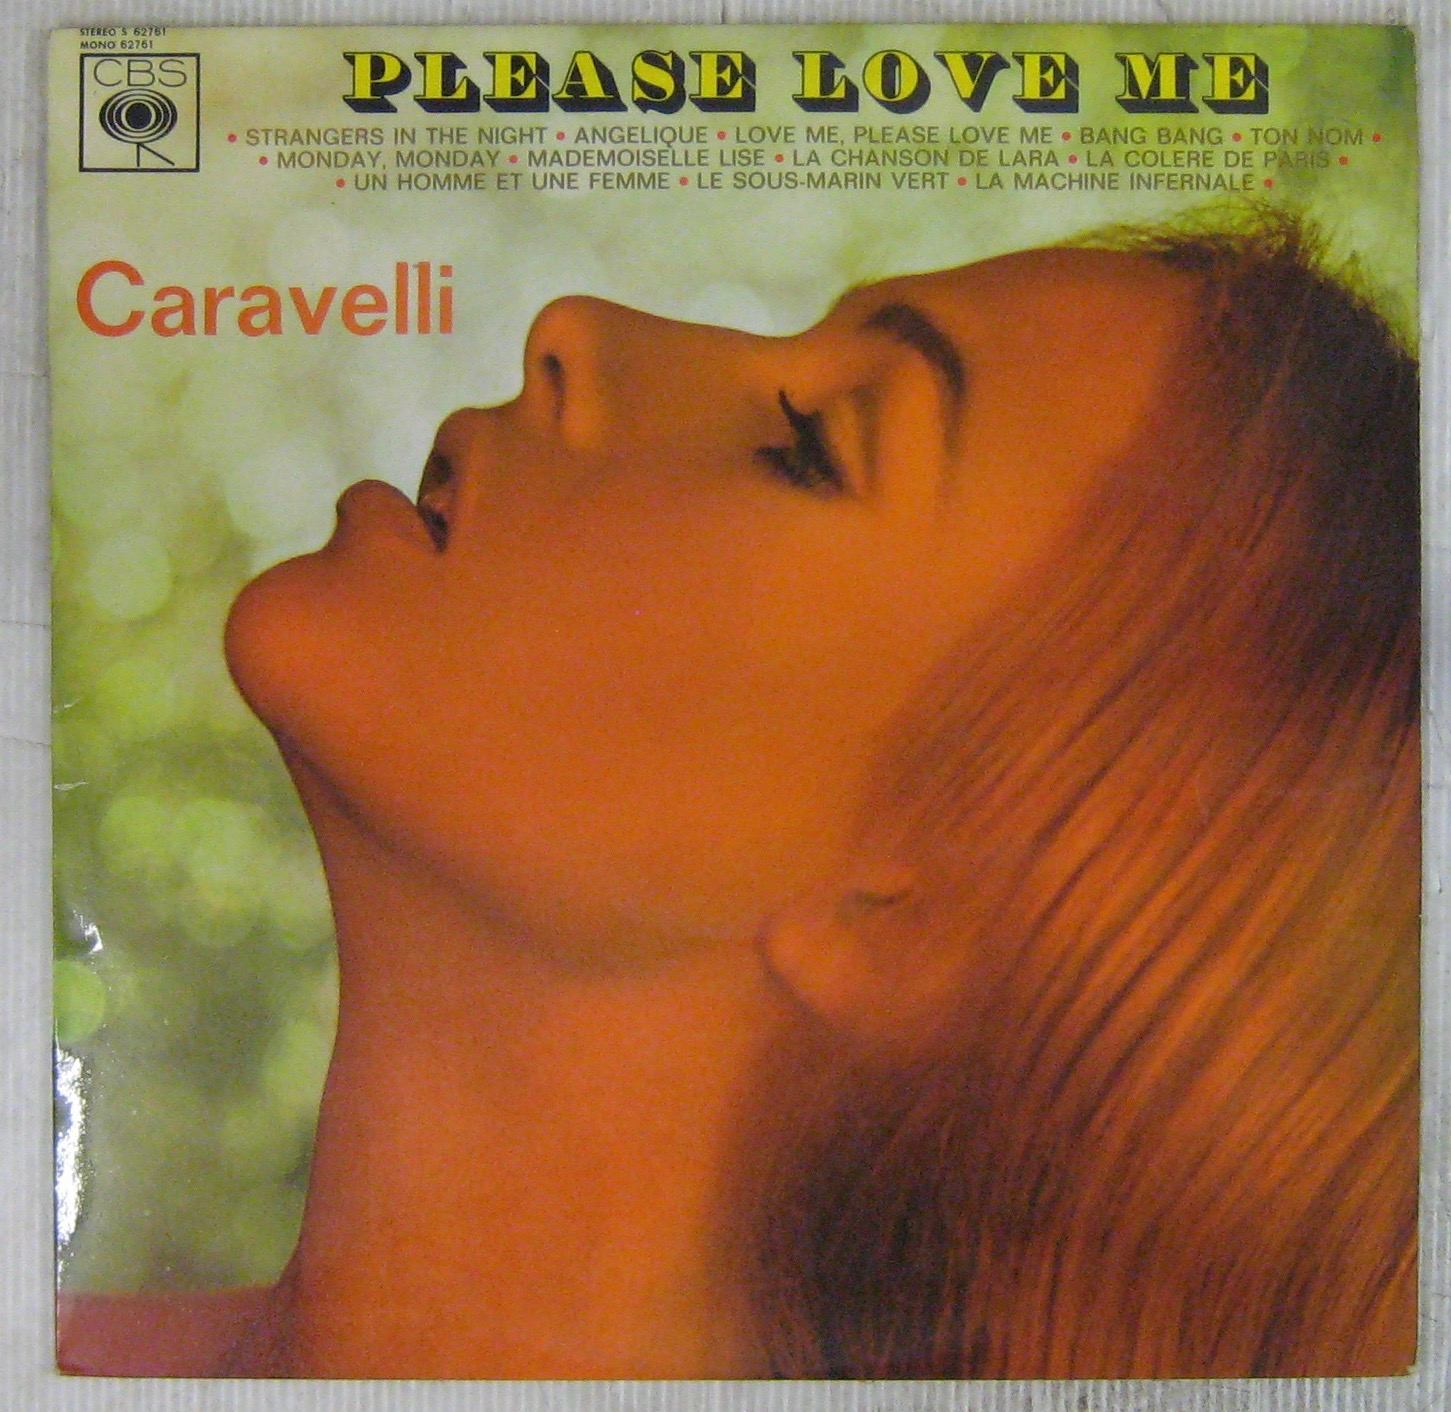 CARAVELLI - Please love me - 33T